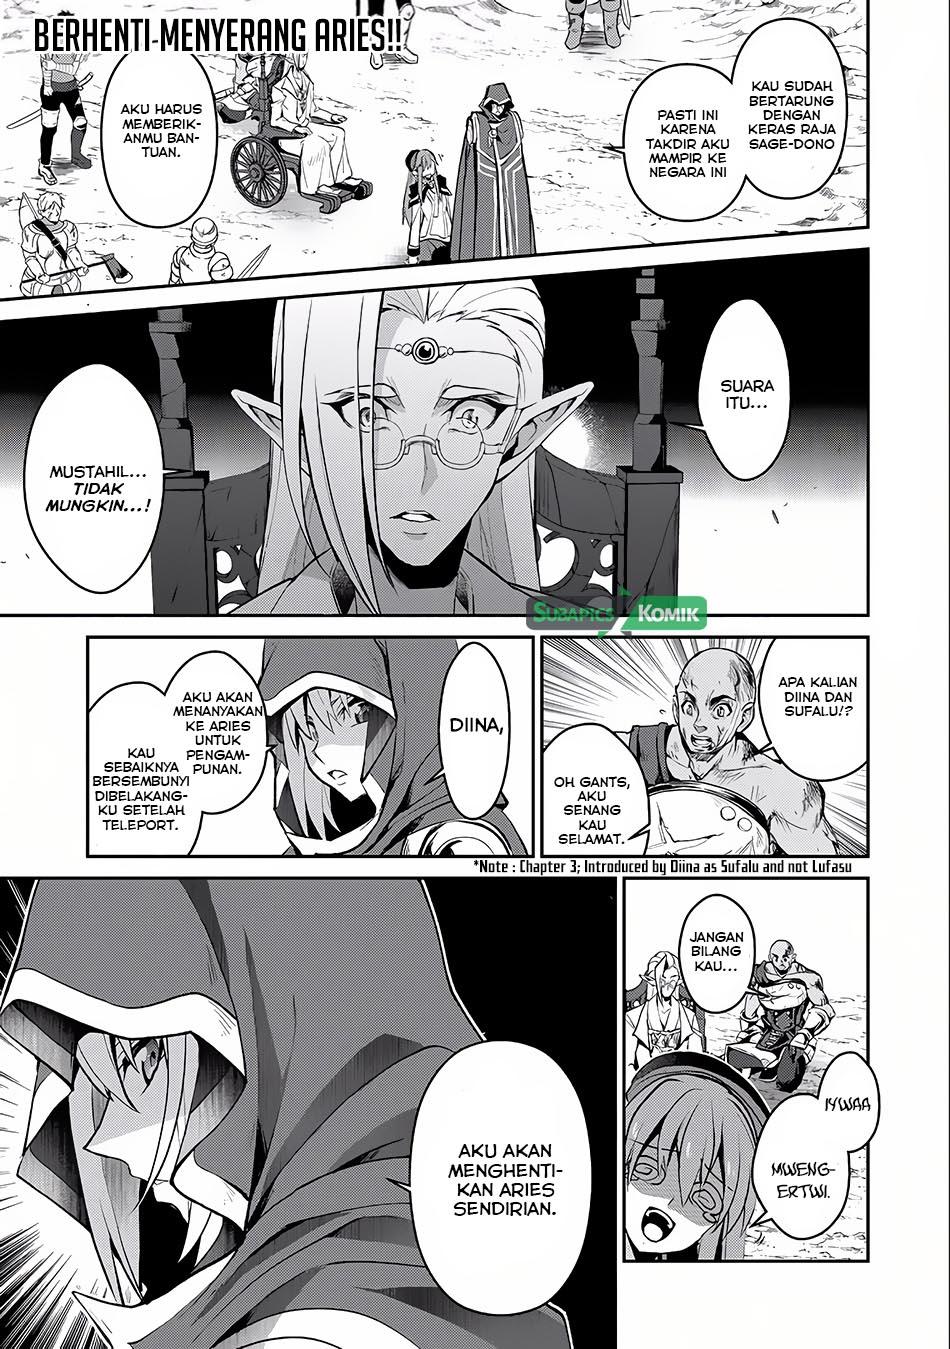 Yasei no Last Boss ga Arawareta: Chapter 05 - Page 2